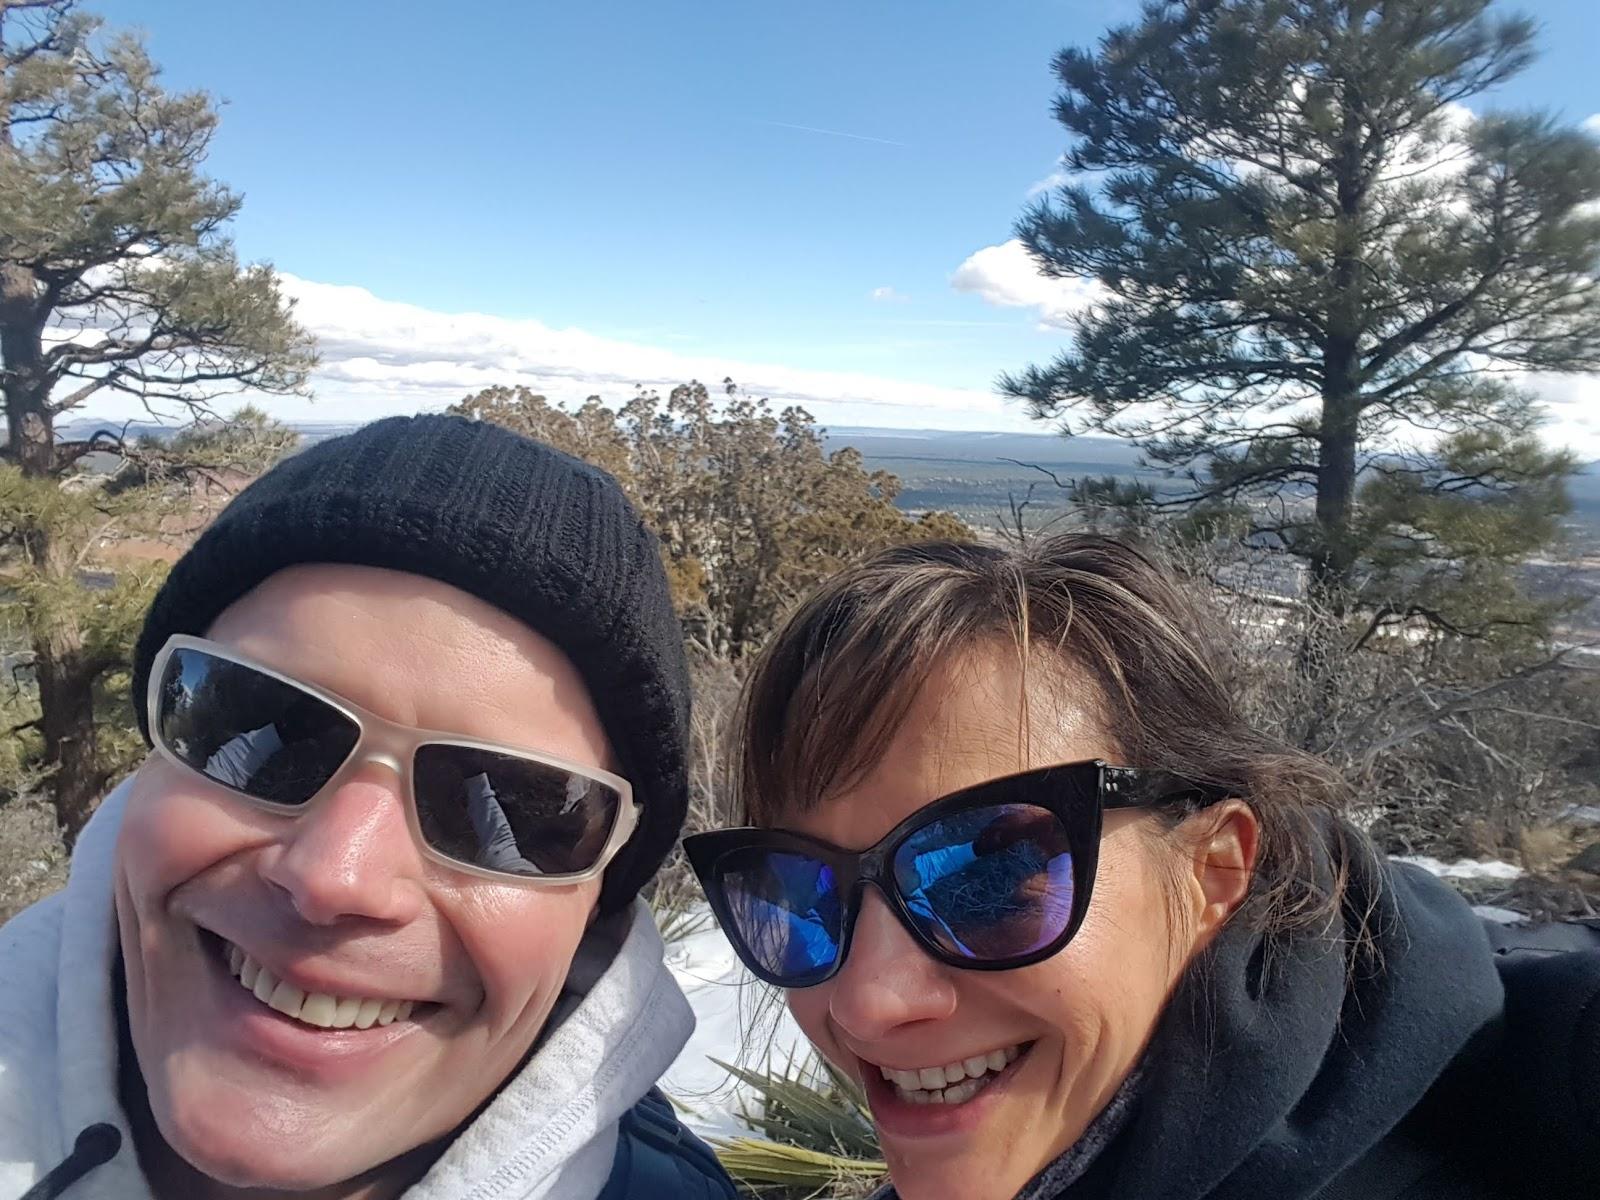 Top of the Elden Lookout Trail